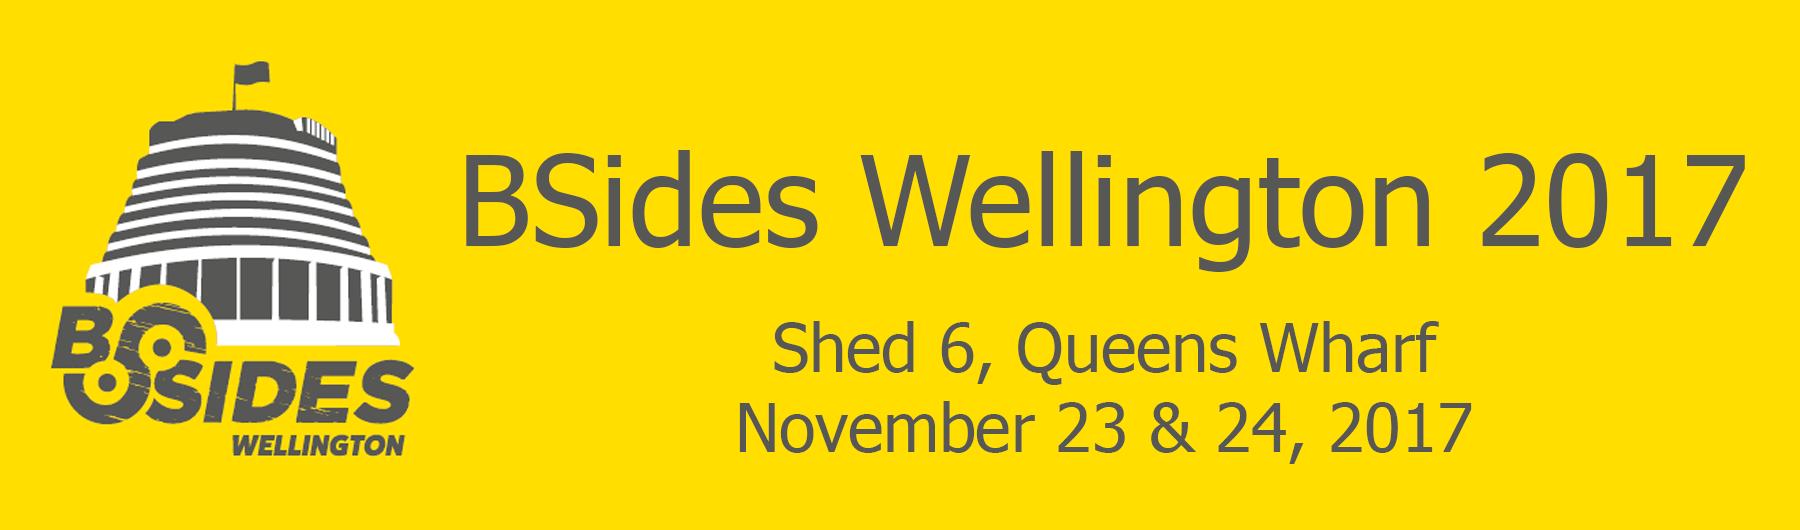 BSides Wellington 2017